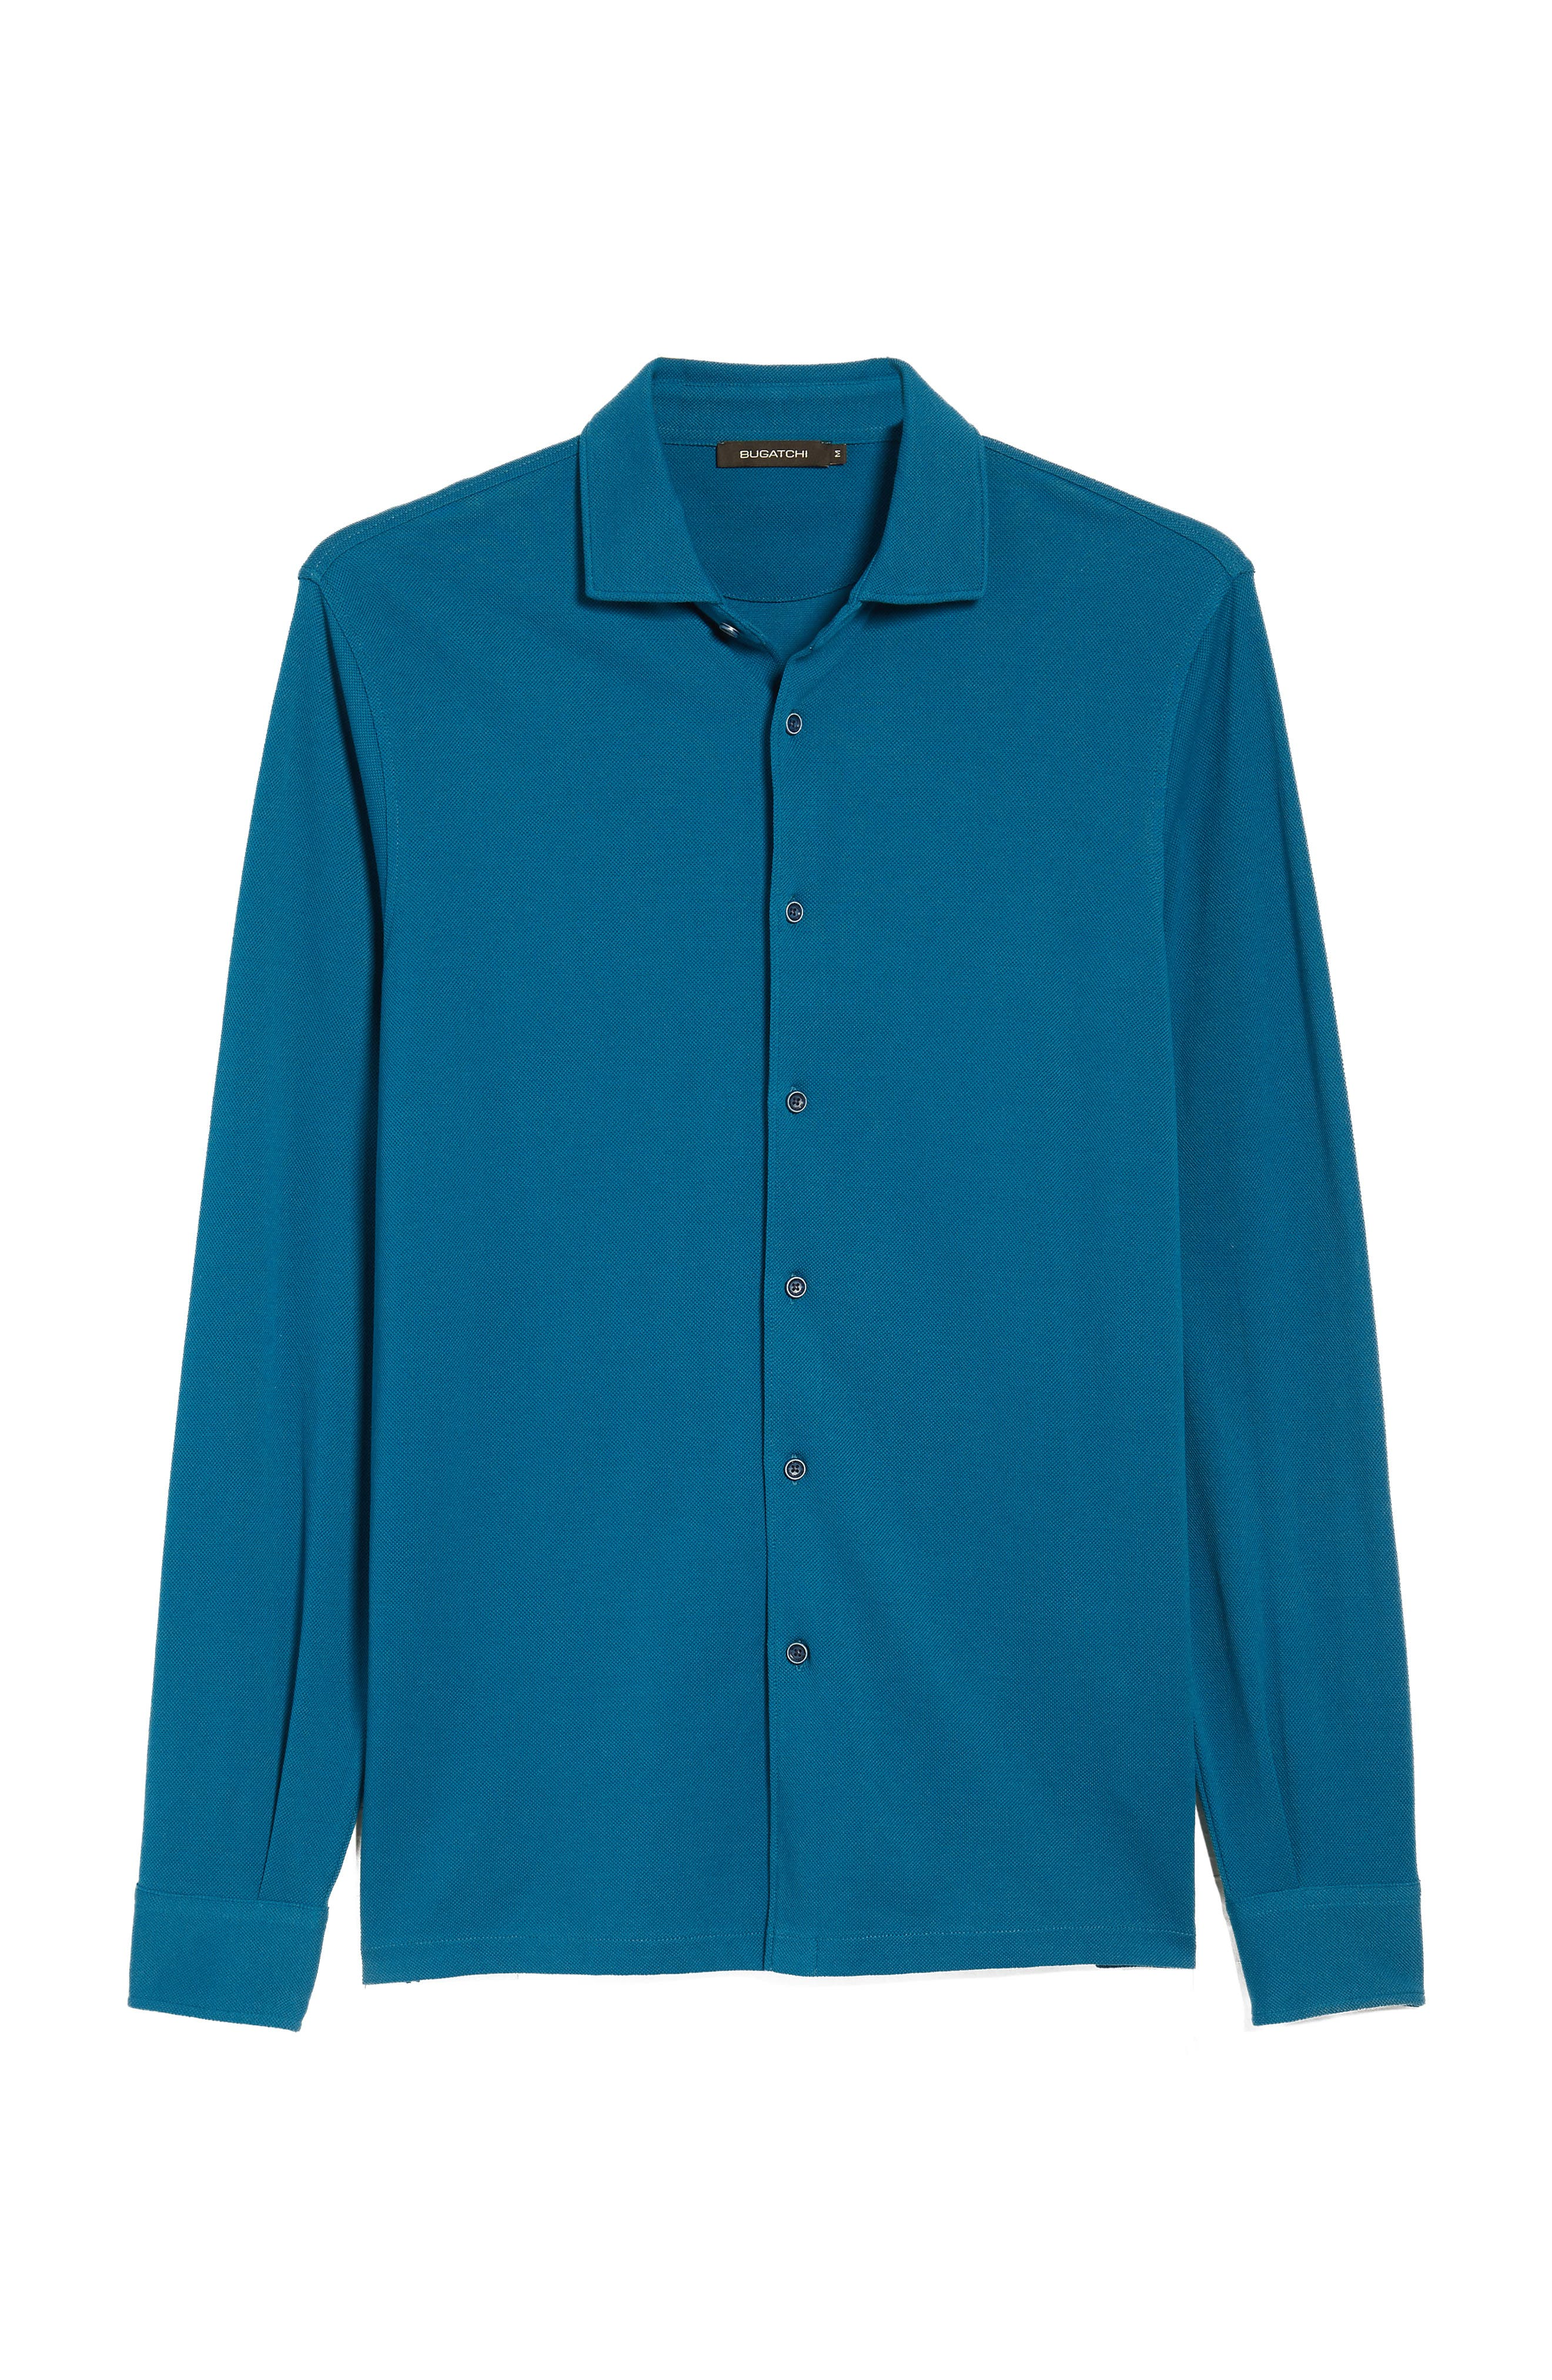 Regular Fit Knit Sport Shirt,                             Alternate thumbnail 6, color,                             Teal